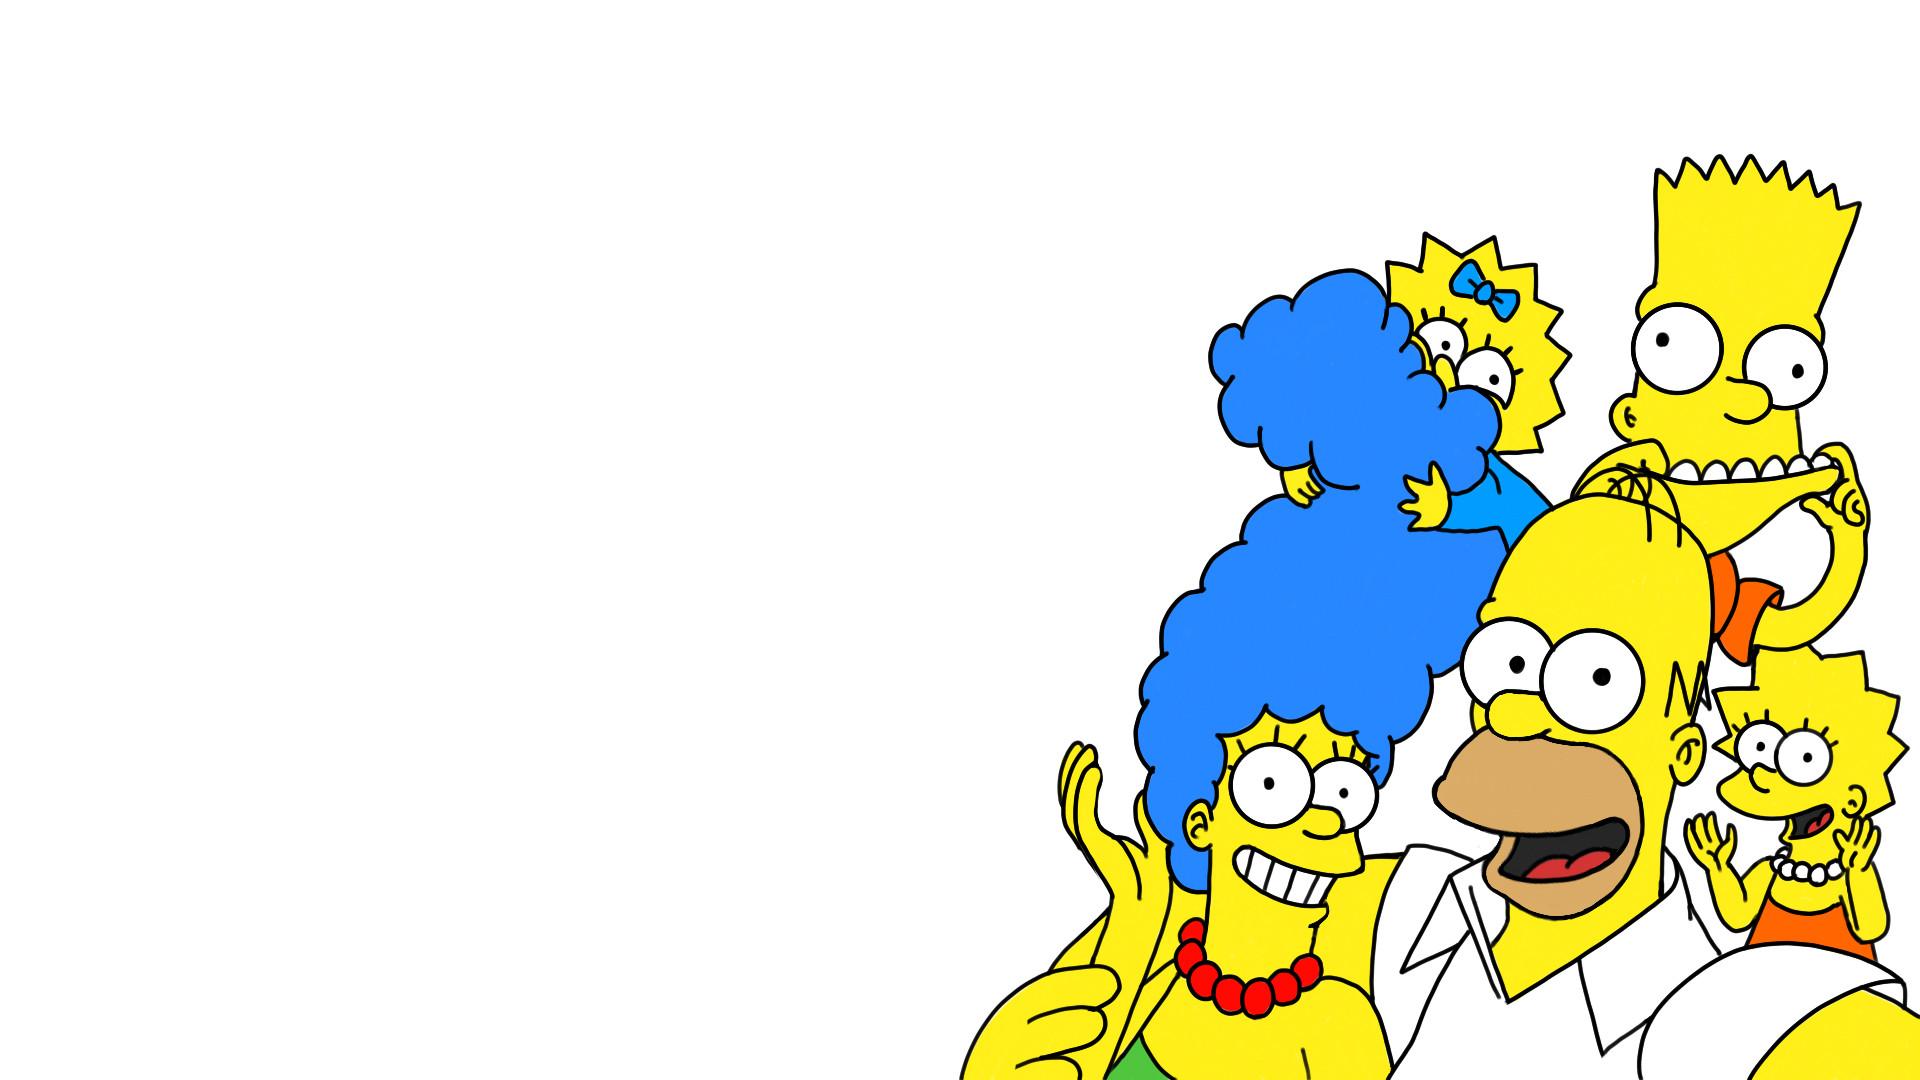 Обои На Телефон Симпсоны